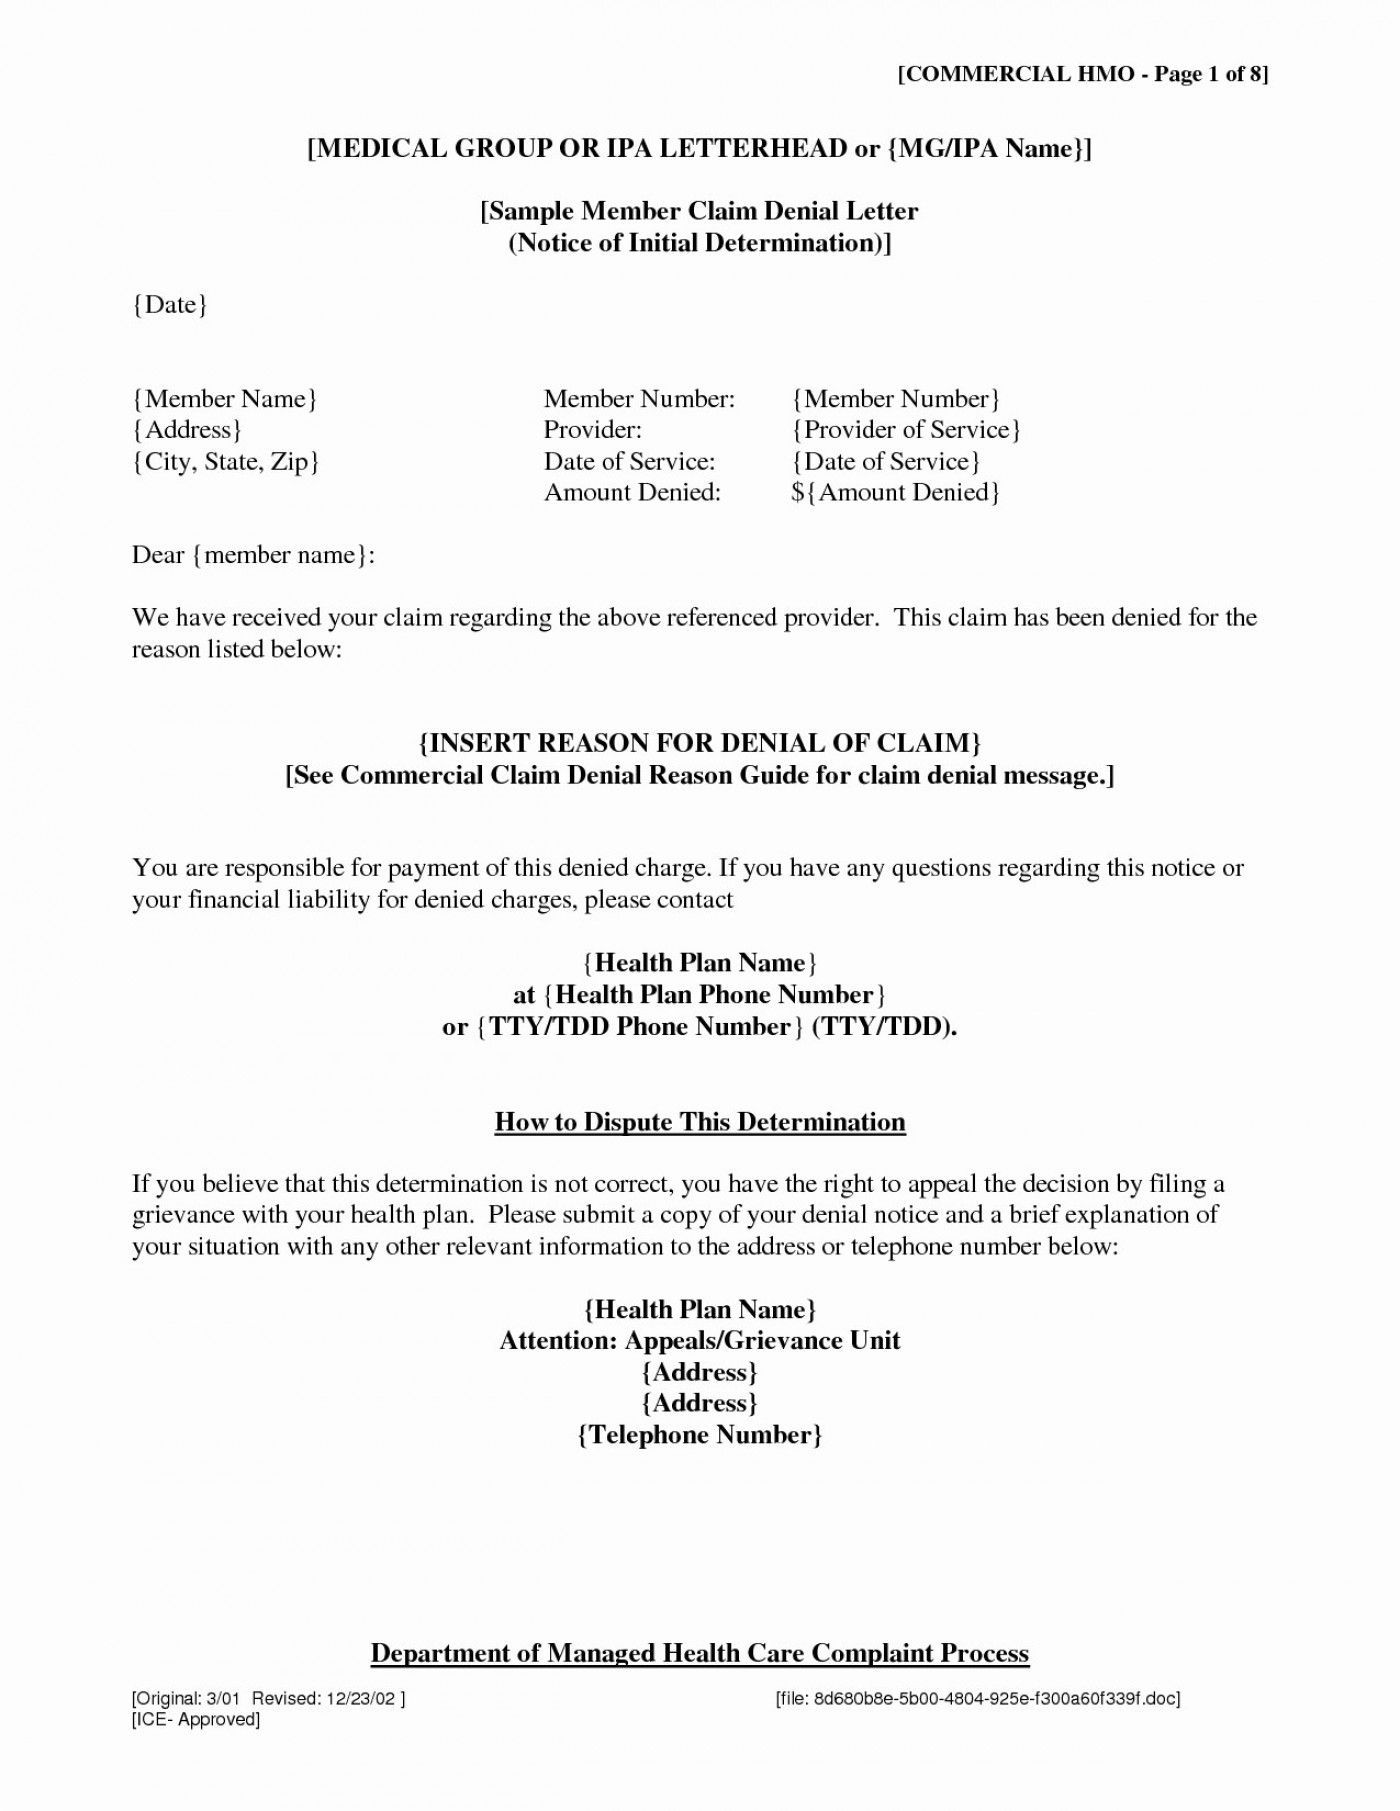 The Interesting 001 Insurance Denial Letter Template Excellent Ideas Appeal Insi Appeal Denial Excellent Ide Letter Templates Lettering Letter Example Claim denial letter sample airline